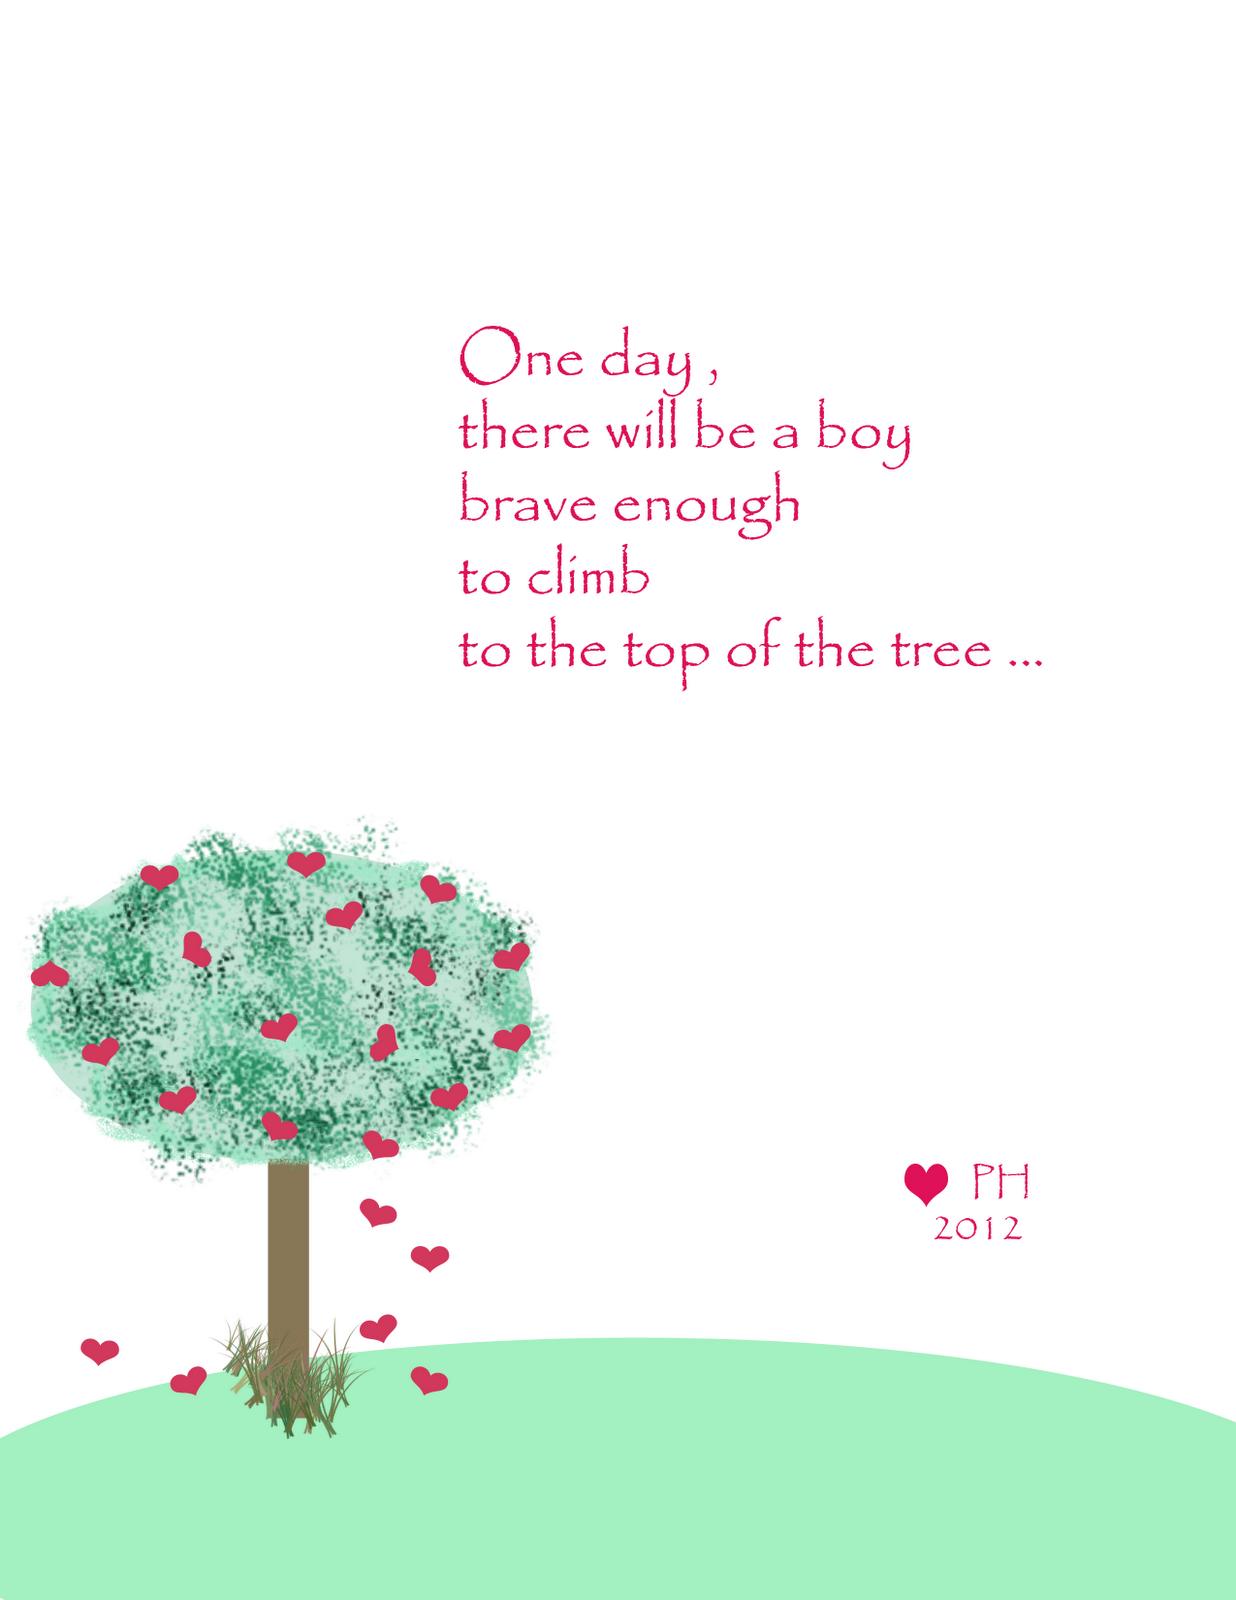 http://4.bp.blogspot.com/-chSZ4YlrKGE/T1714juTD5I/AAAAAAAAEGk/eCvtQNQ2ftA/s1600/Tree+of+Love+Challenge_Shwe+Khit_2012+copy.png